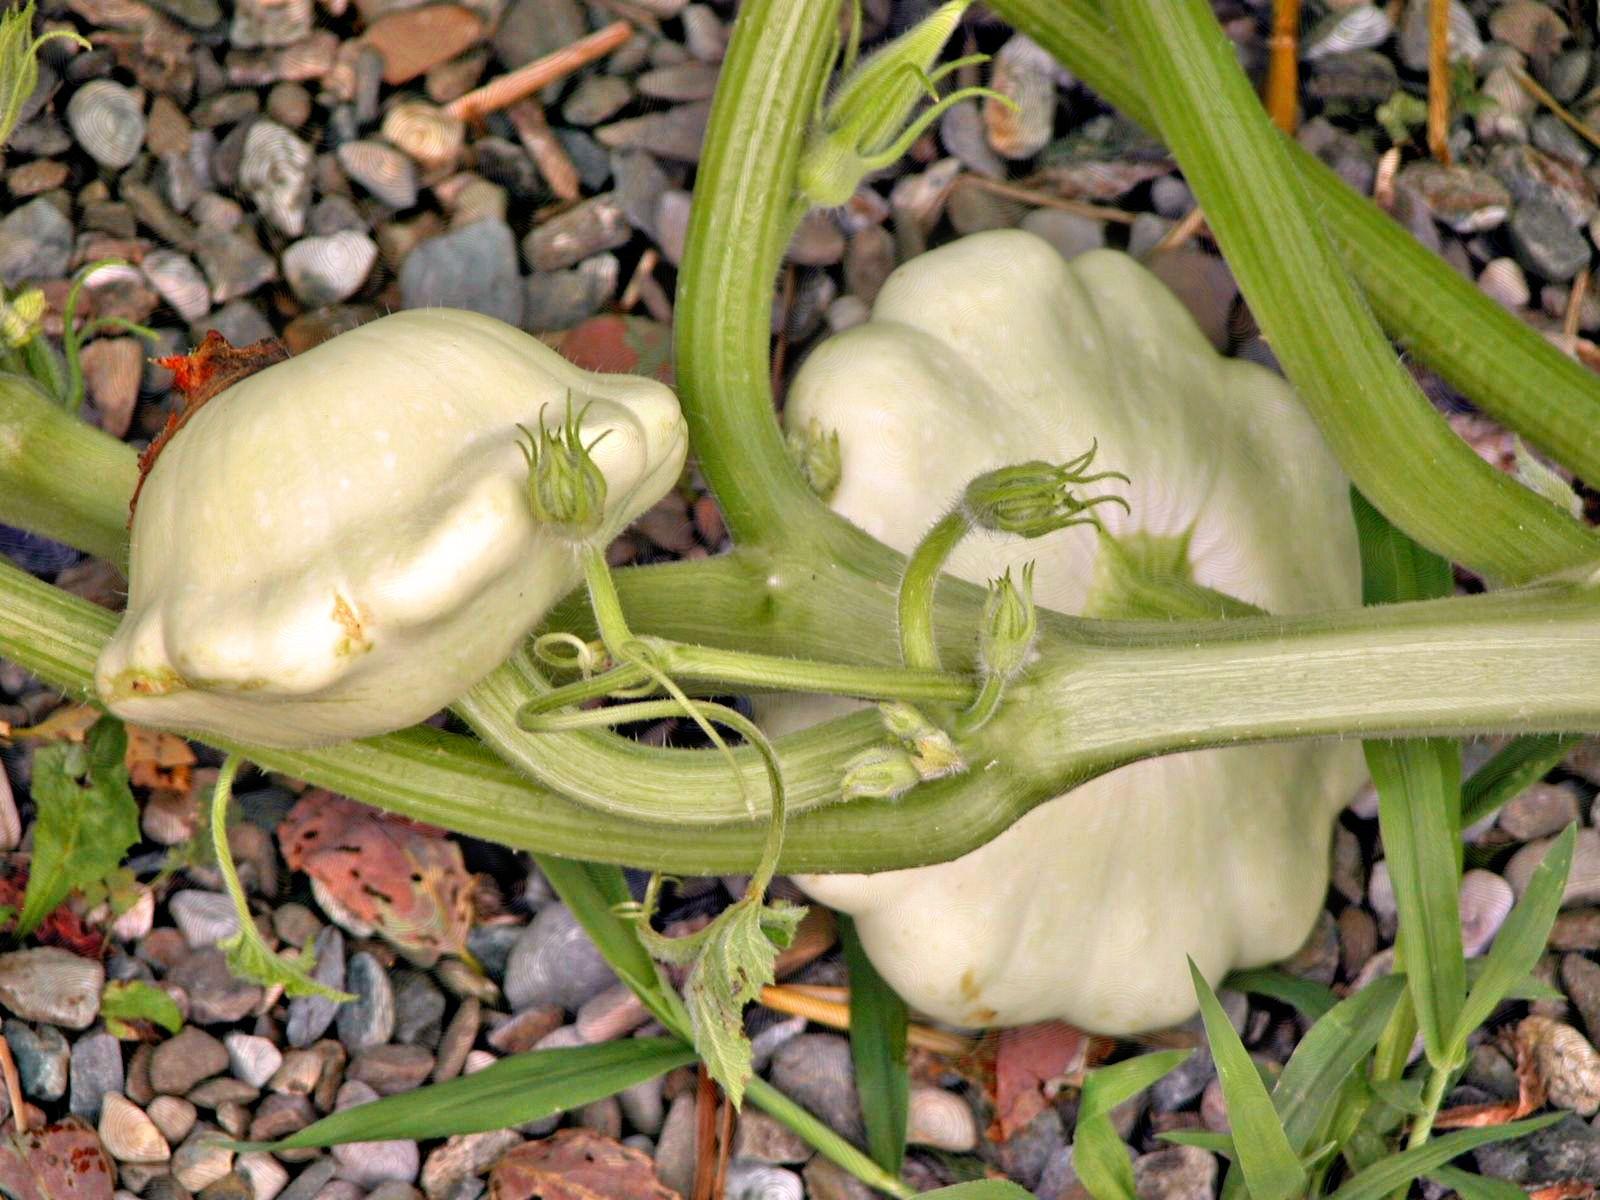 How To Grow Patty Pan Squash